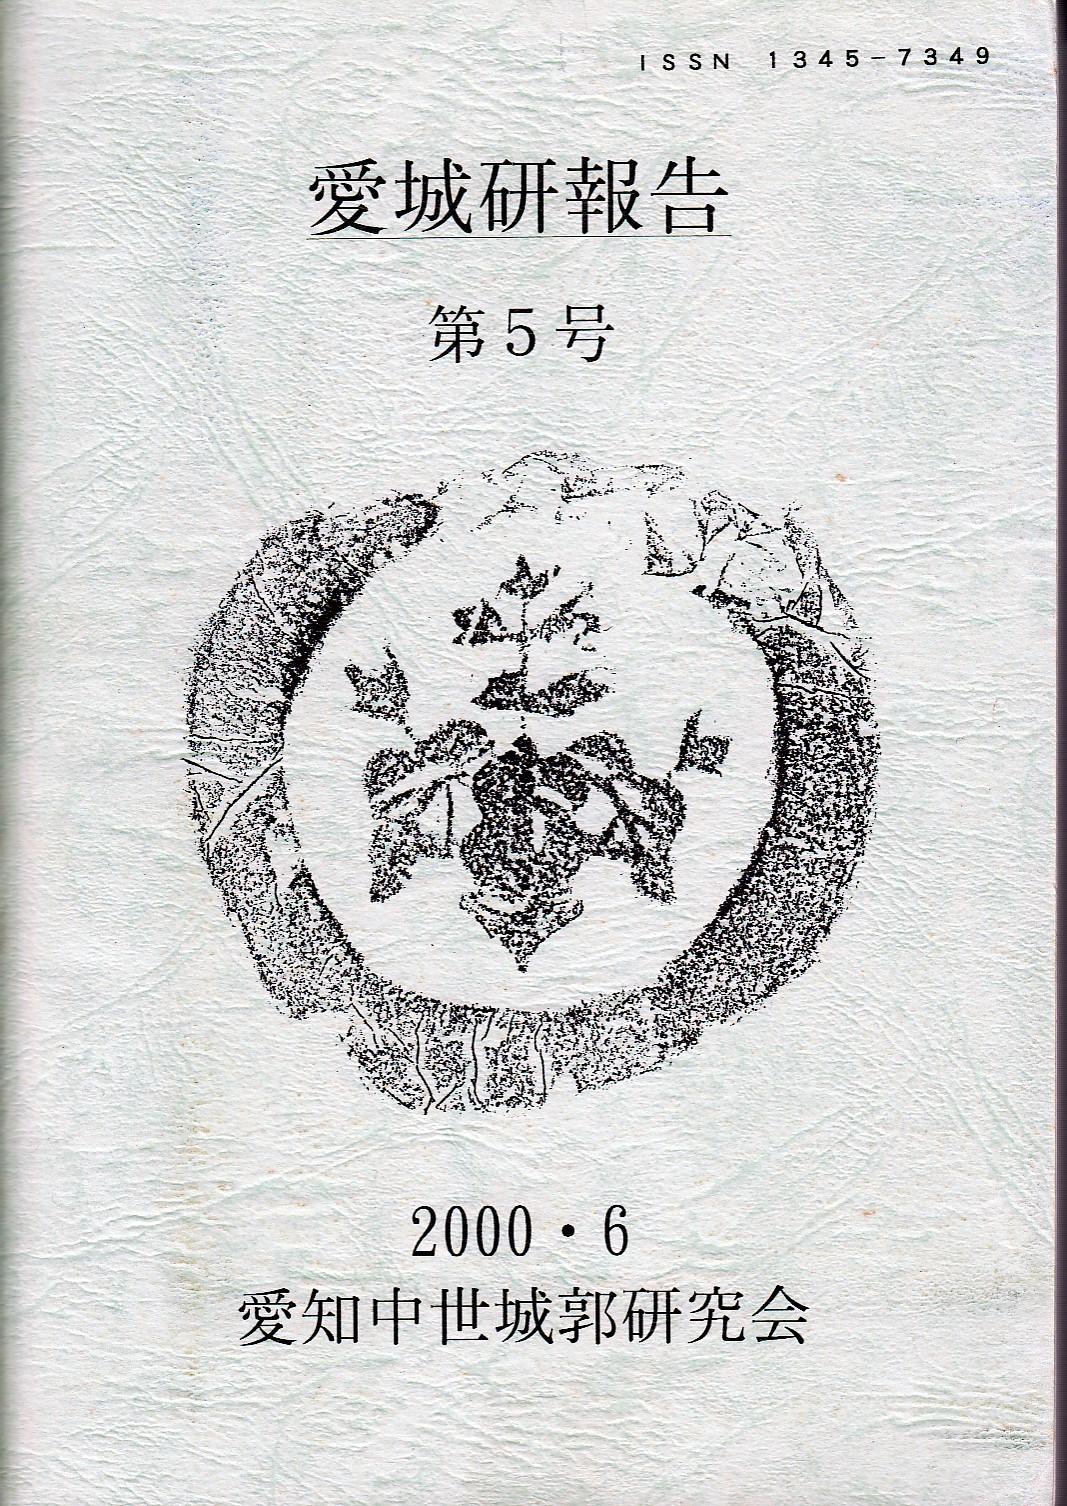 No-0096